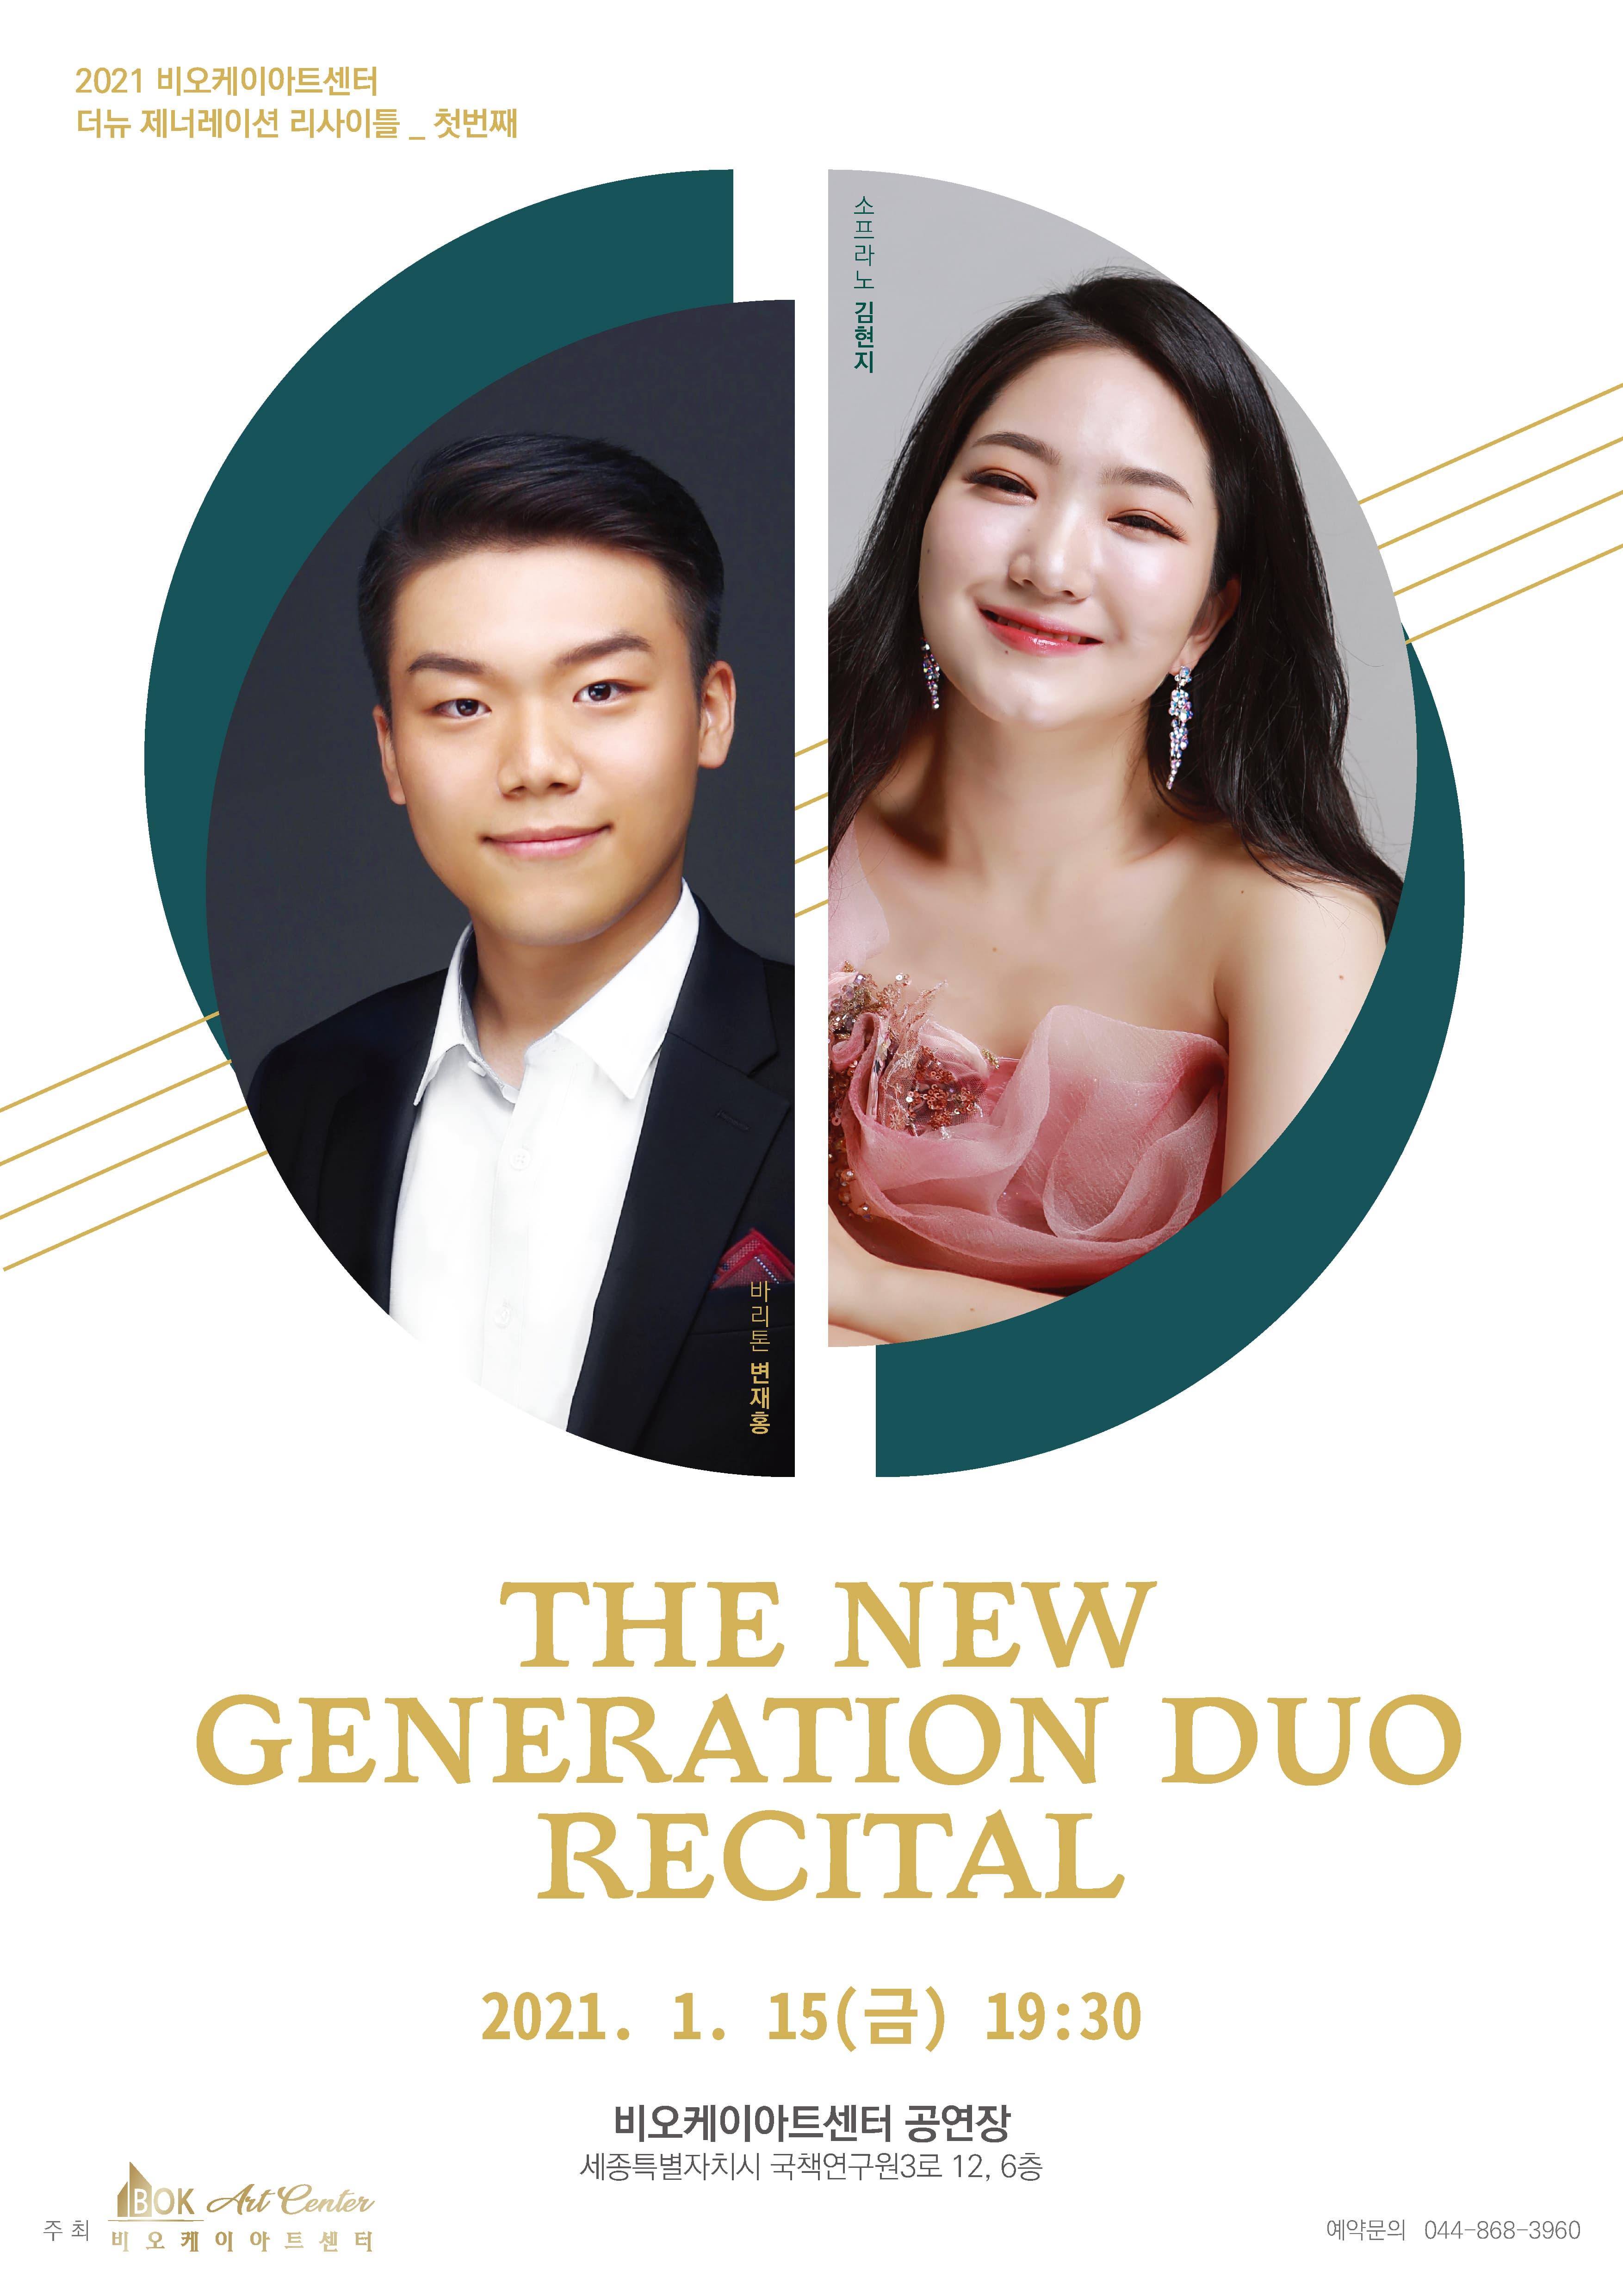 The New Generation Duo Recital